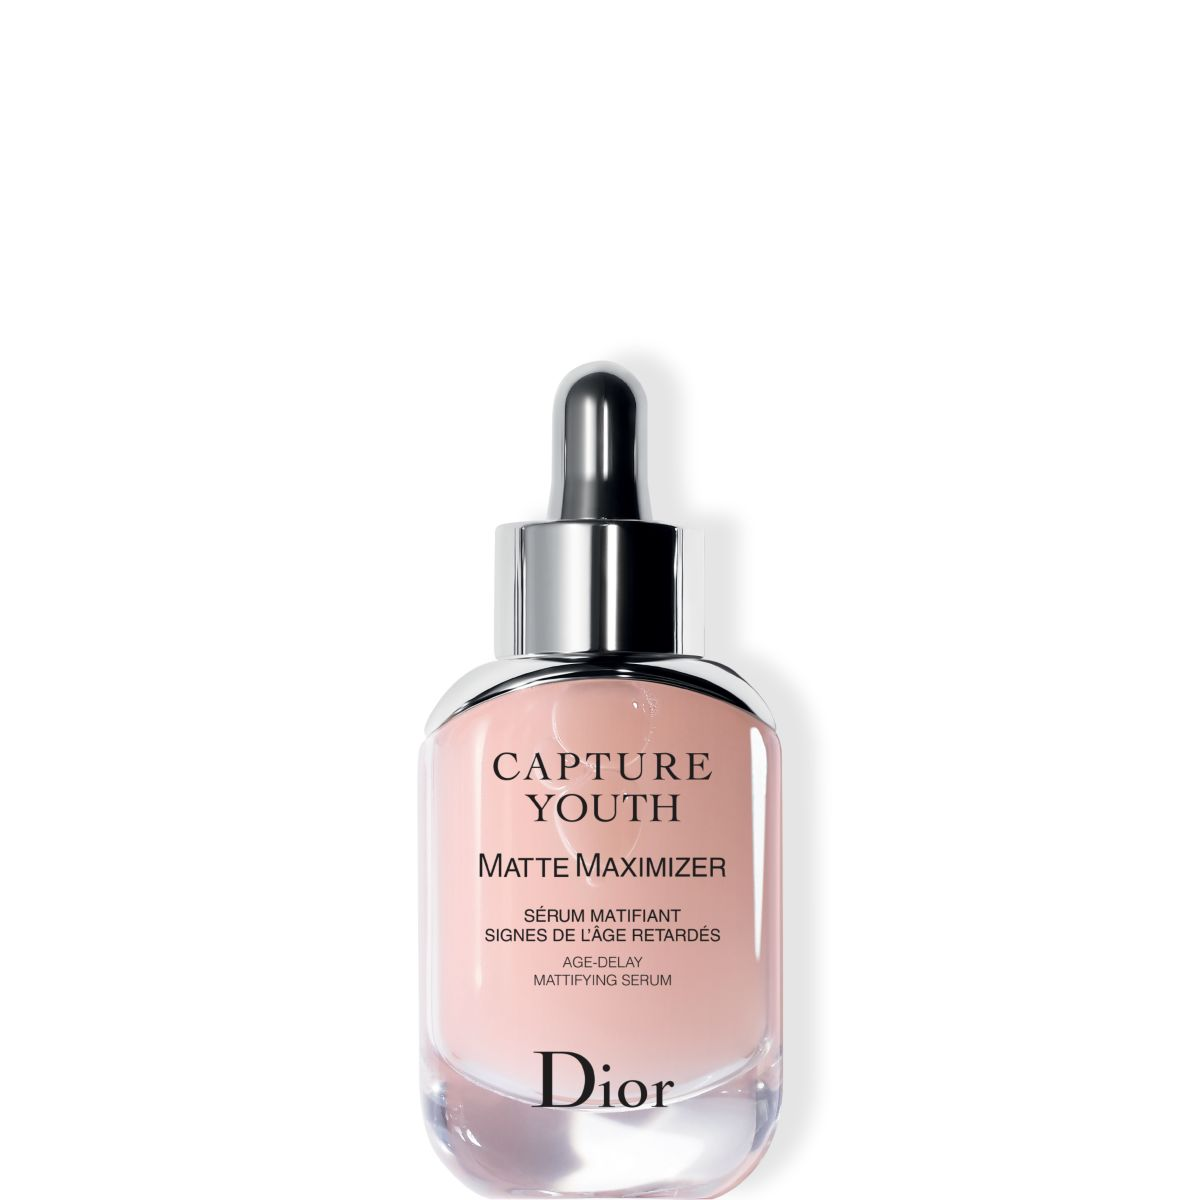 Dior - Capture Youth - Matte Maximizer Sérum matifiant